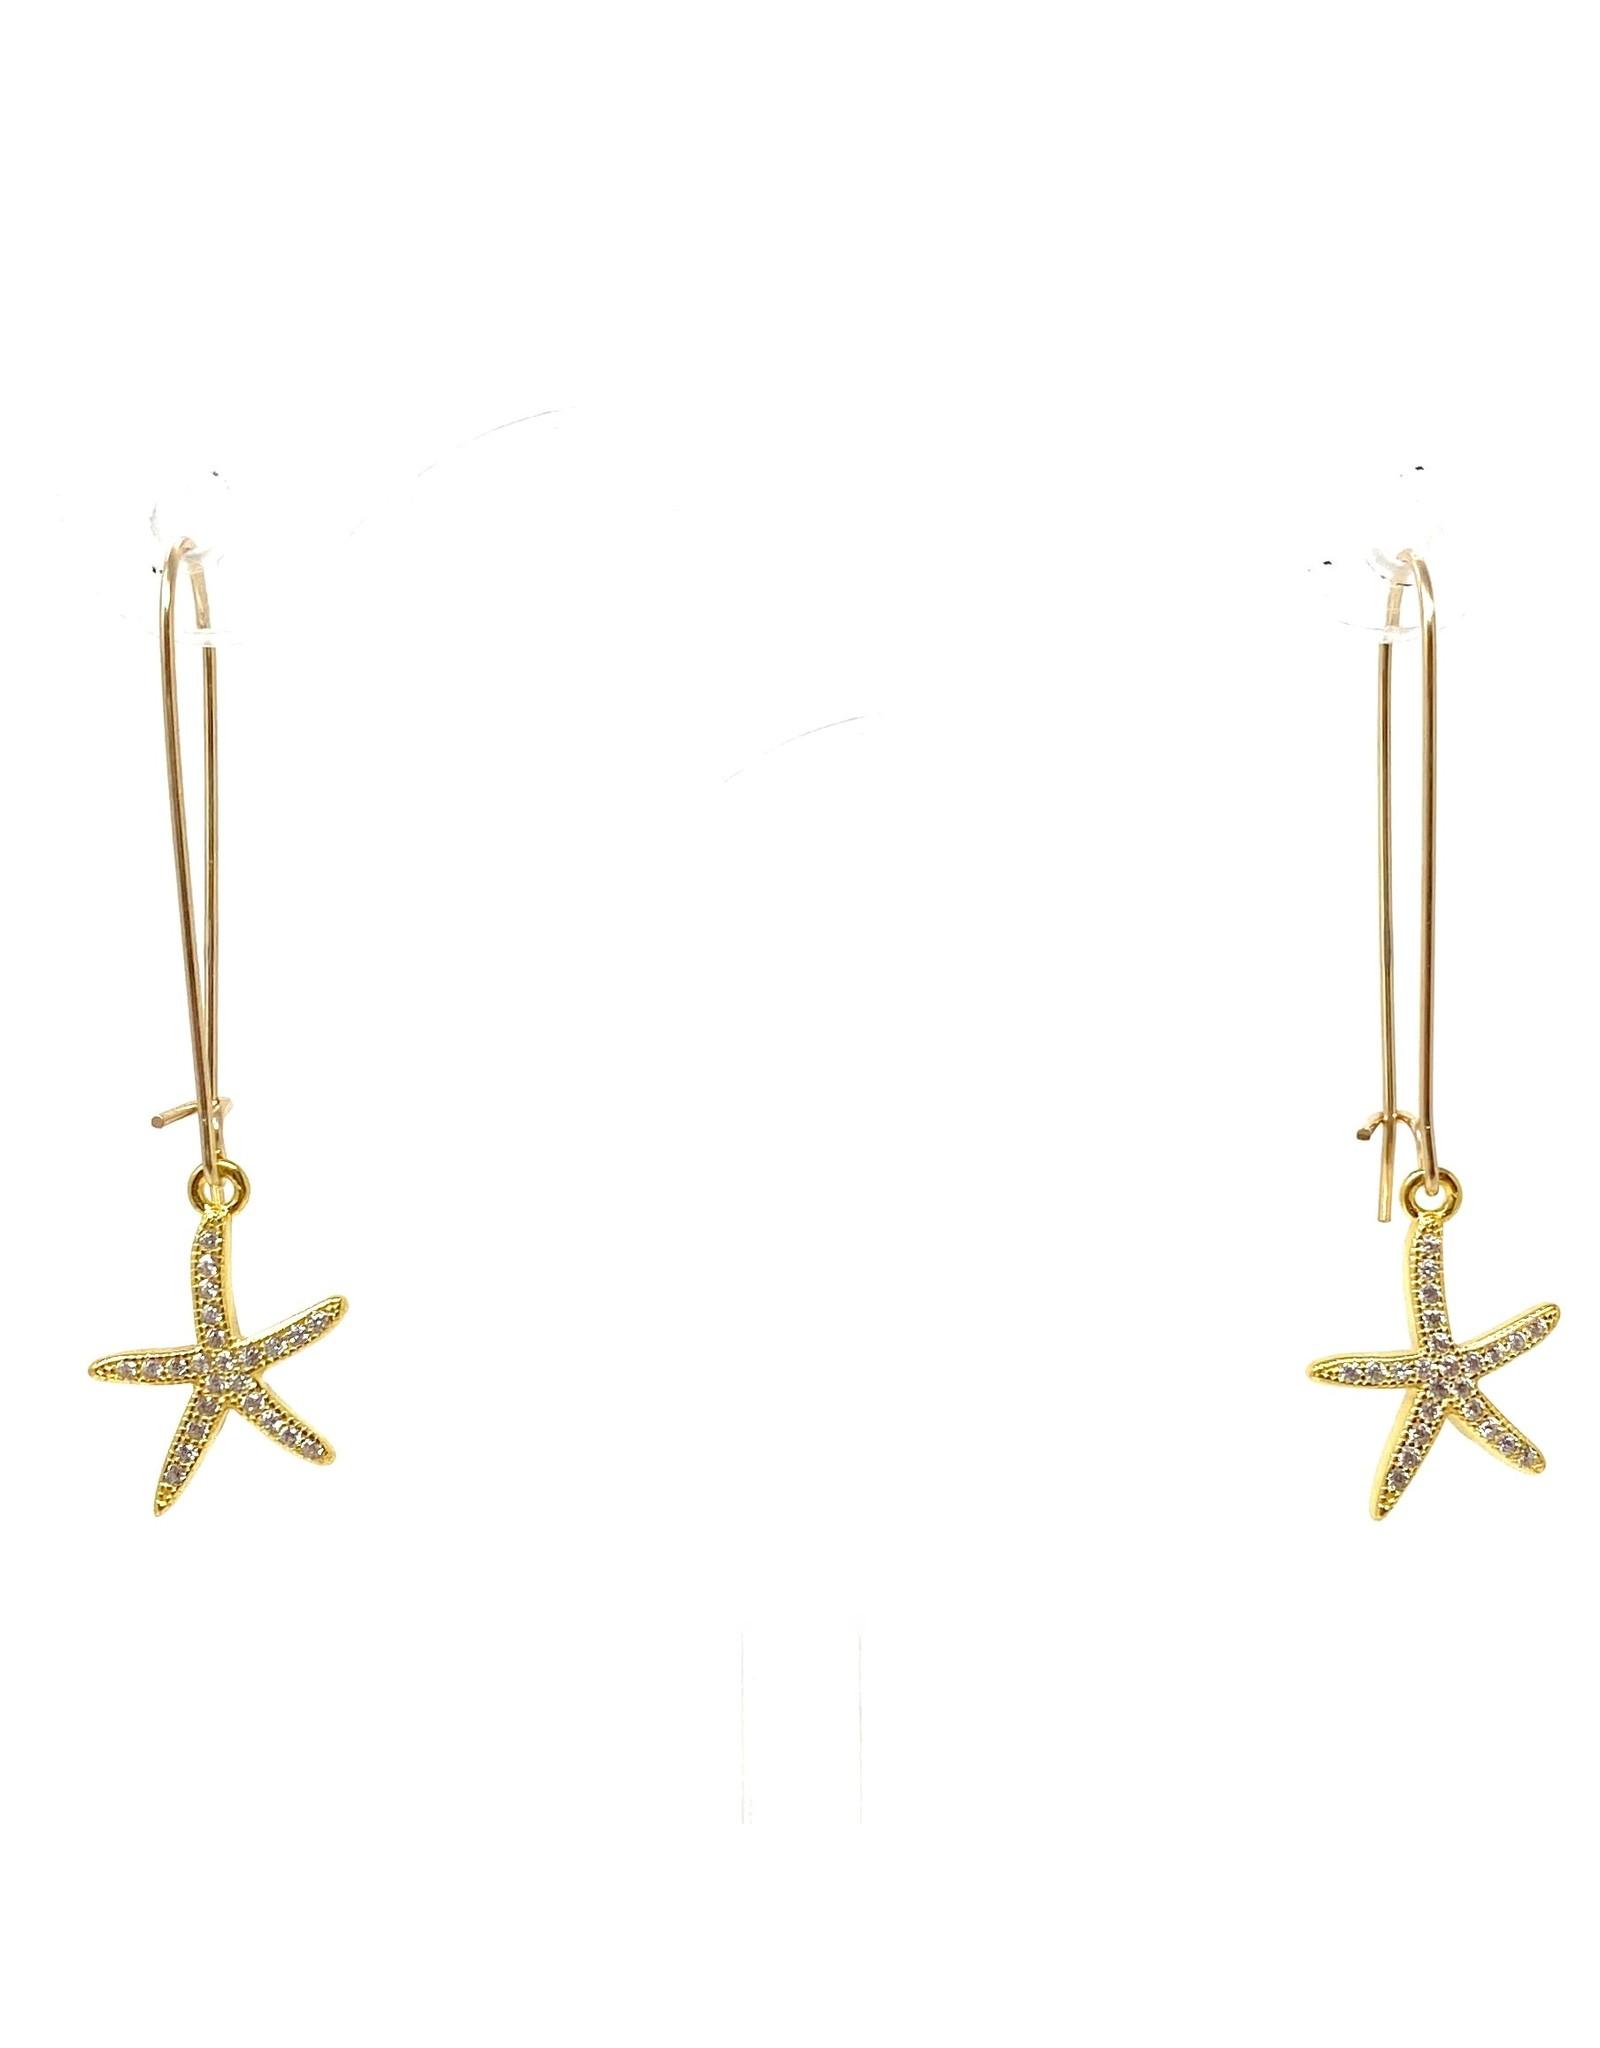 14kg GP Sterling CZ Starfish Earrings